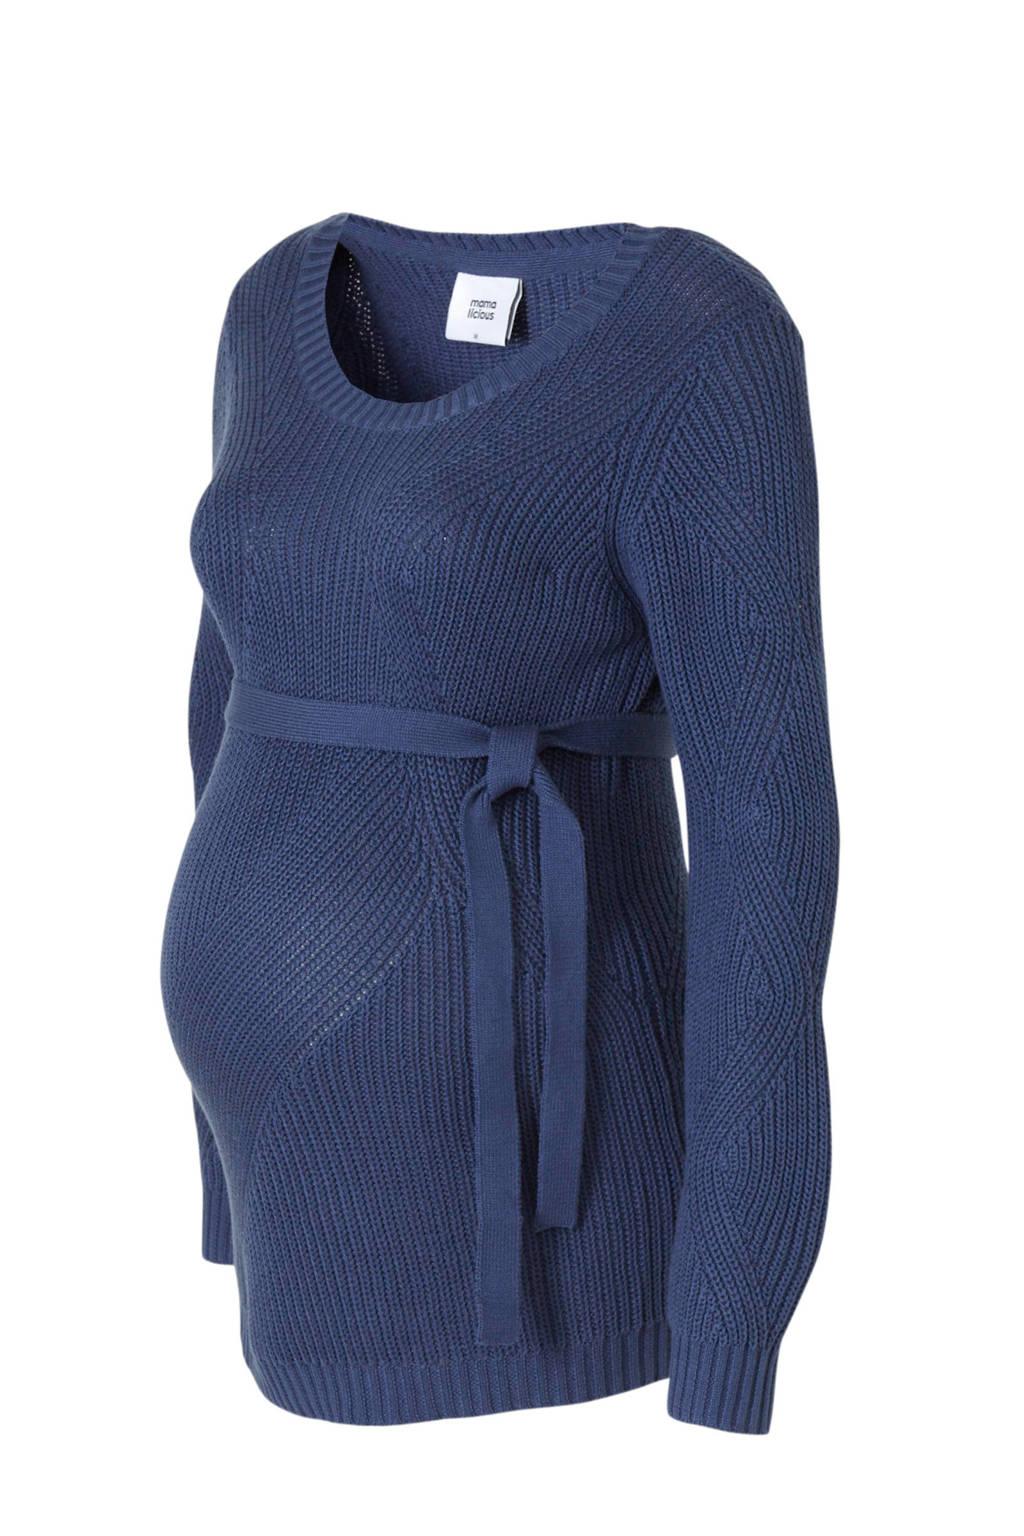 MAMALICIOUS gebreide zwangerschapstrui met textuur donkerblauw, Donkerblauw